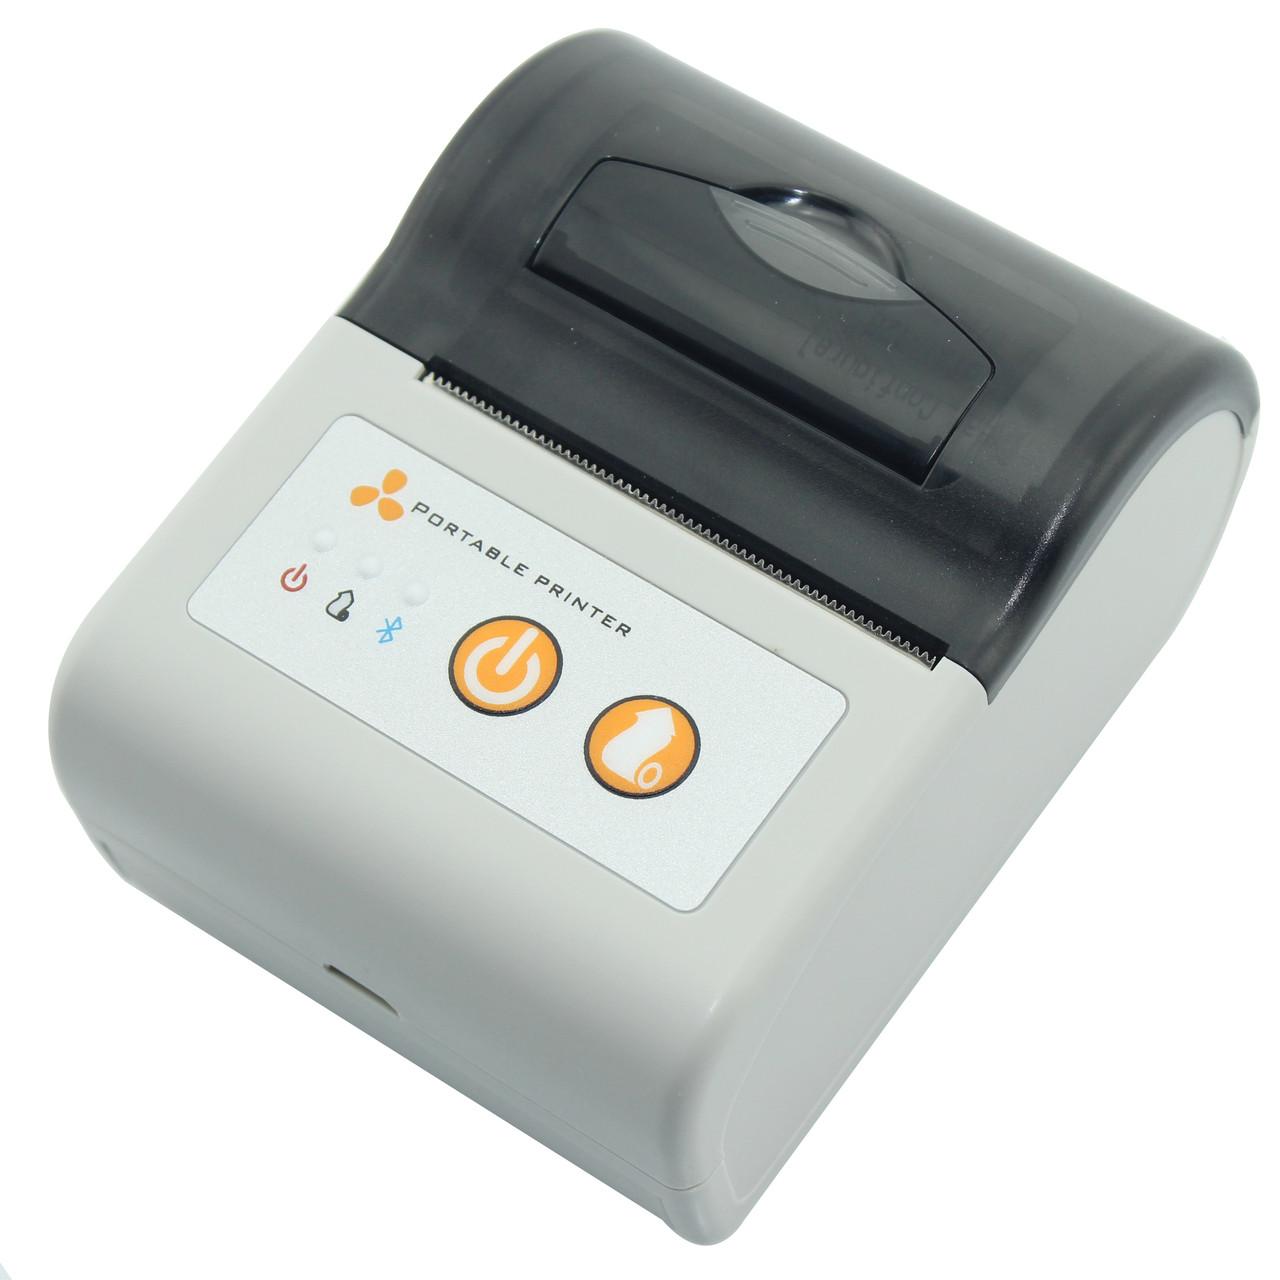 Мобильный принтер этикеток, чеков 58мм AW-58A AsianWell беспроводный, bluetooth, Android, Windows, iOS